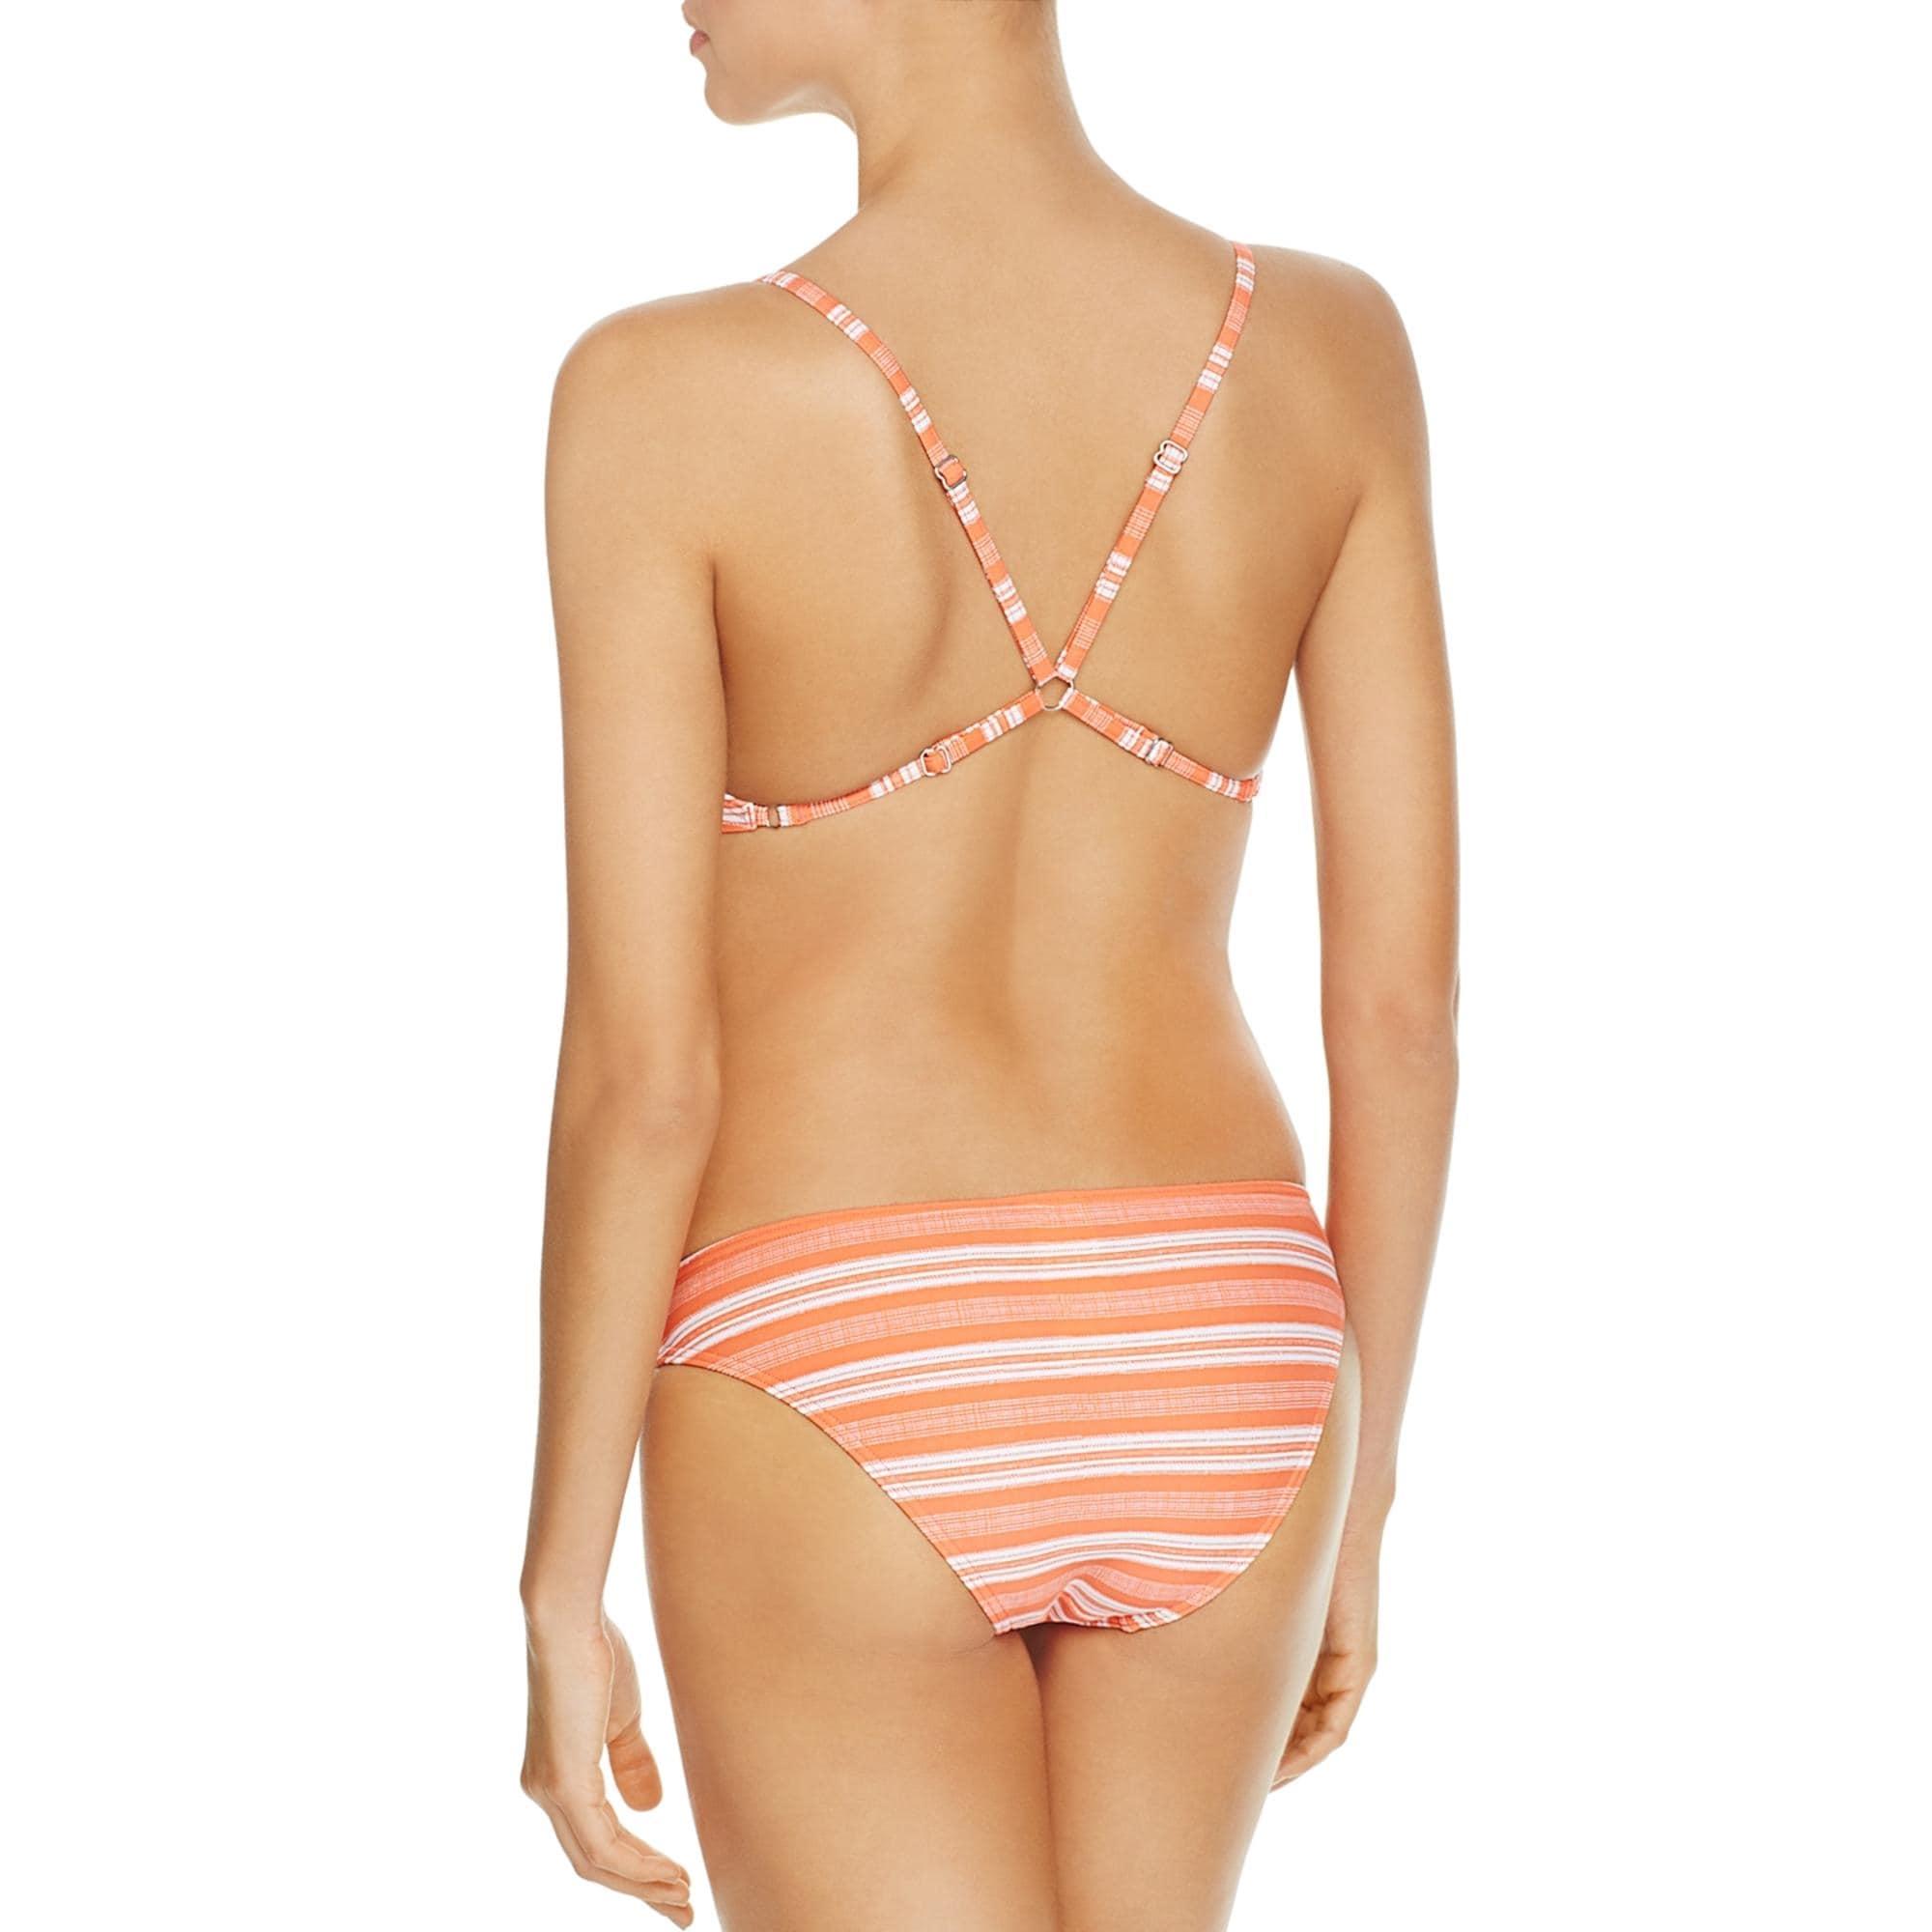 Minkpink Womens Print Full Hipster Swim Bottom Separates BHFO 8272